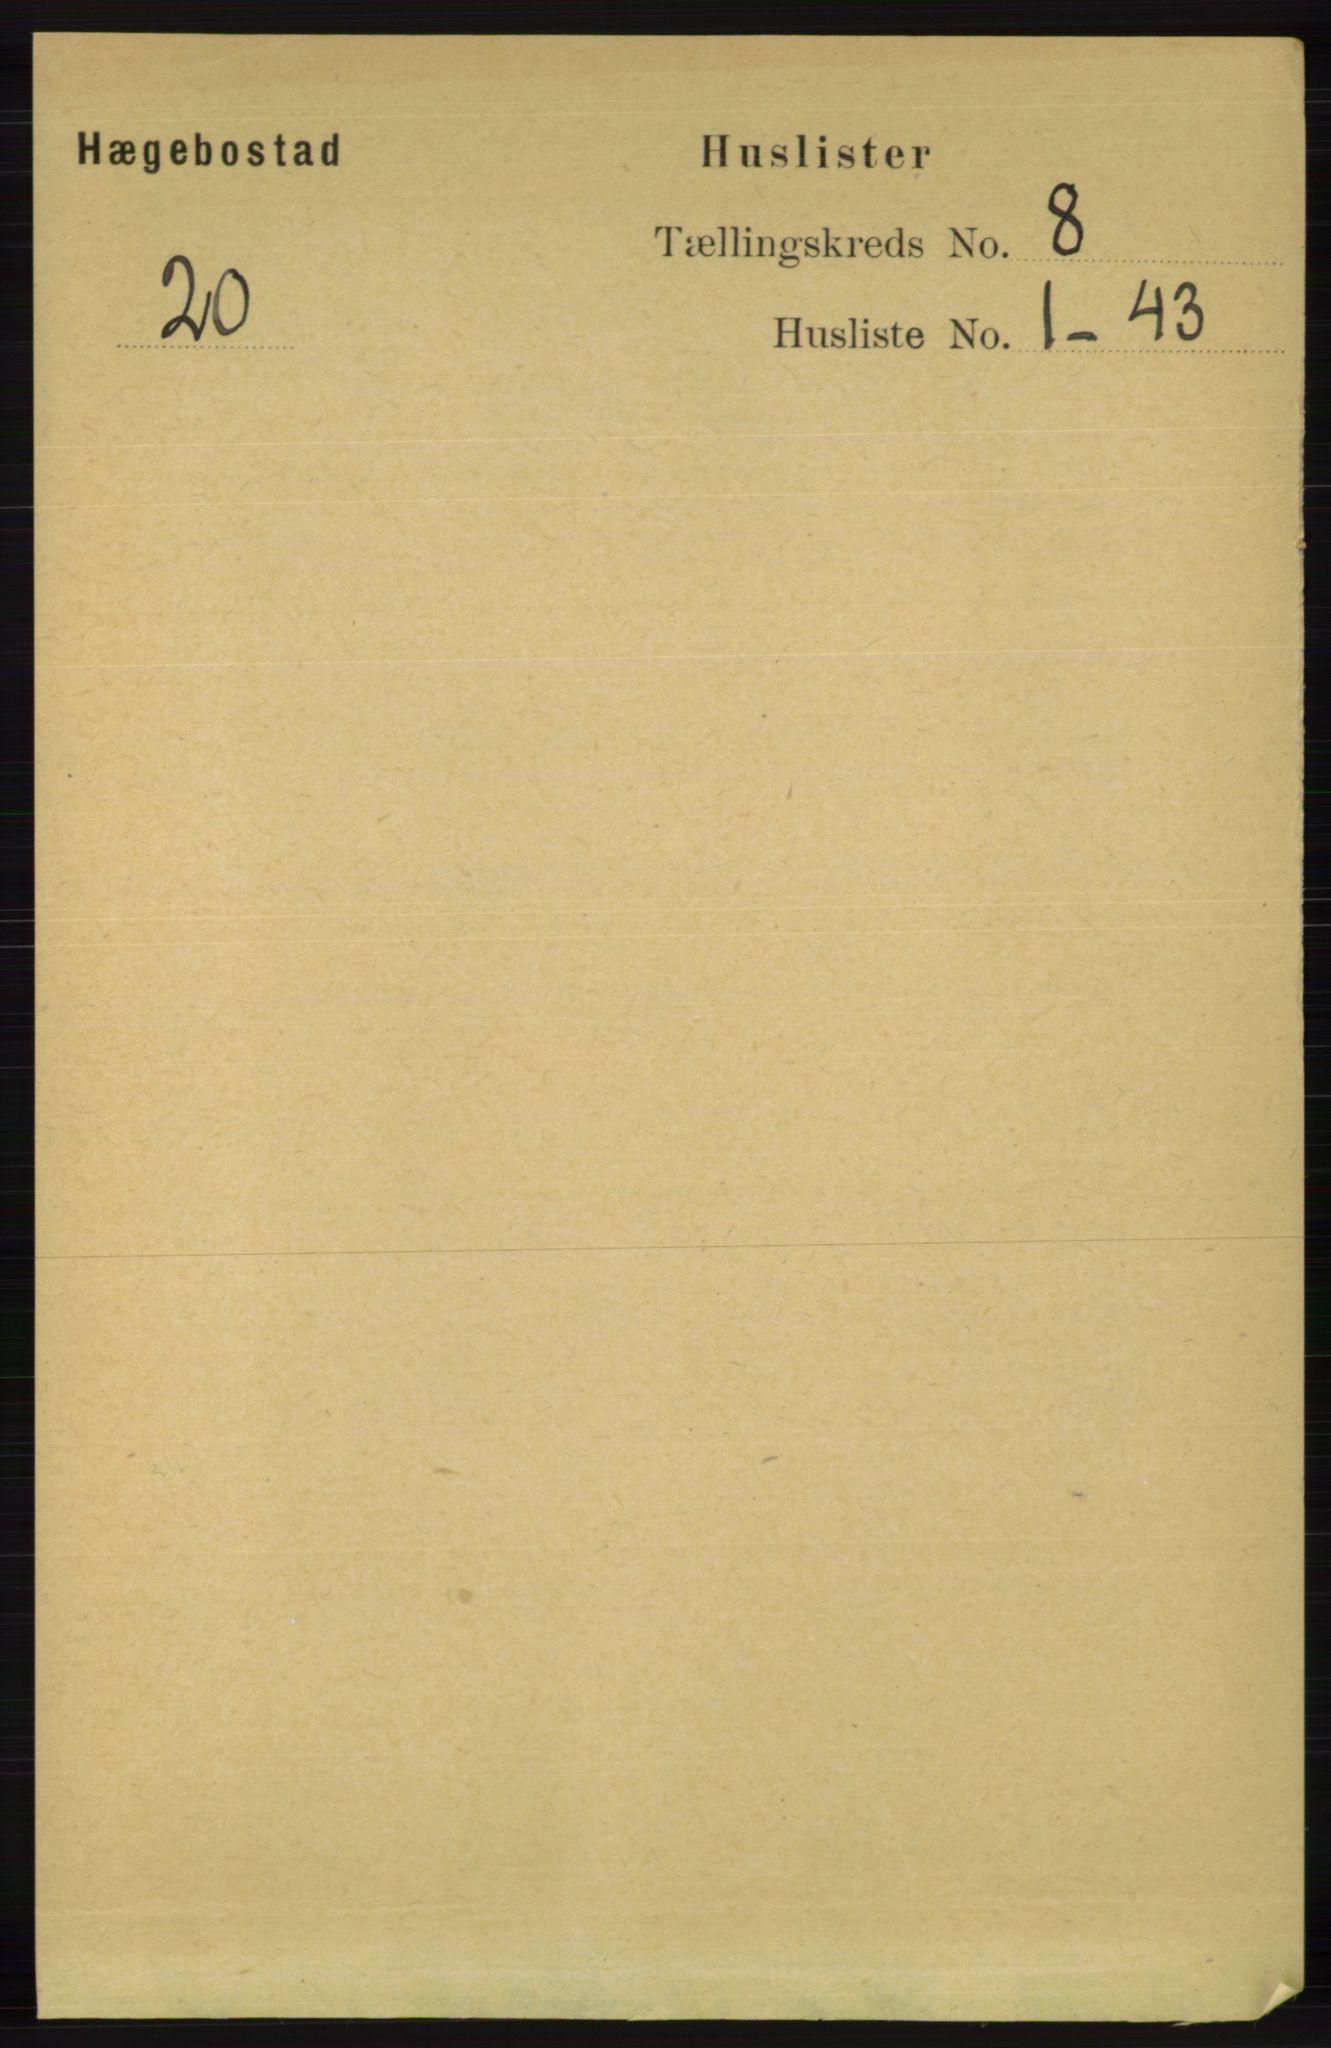 RA, Folketelling 1891 for 1034 Hægebostad herred, 1891, s. 2419